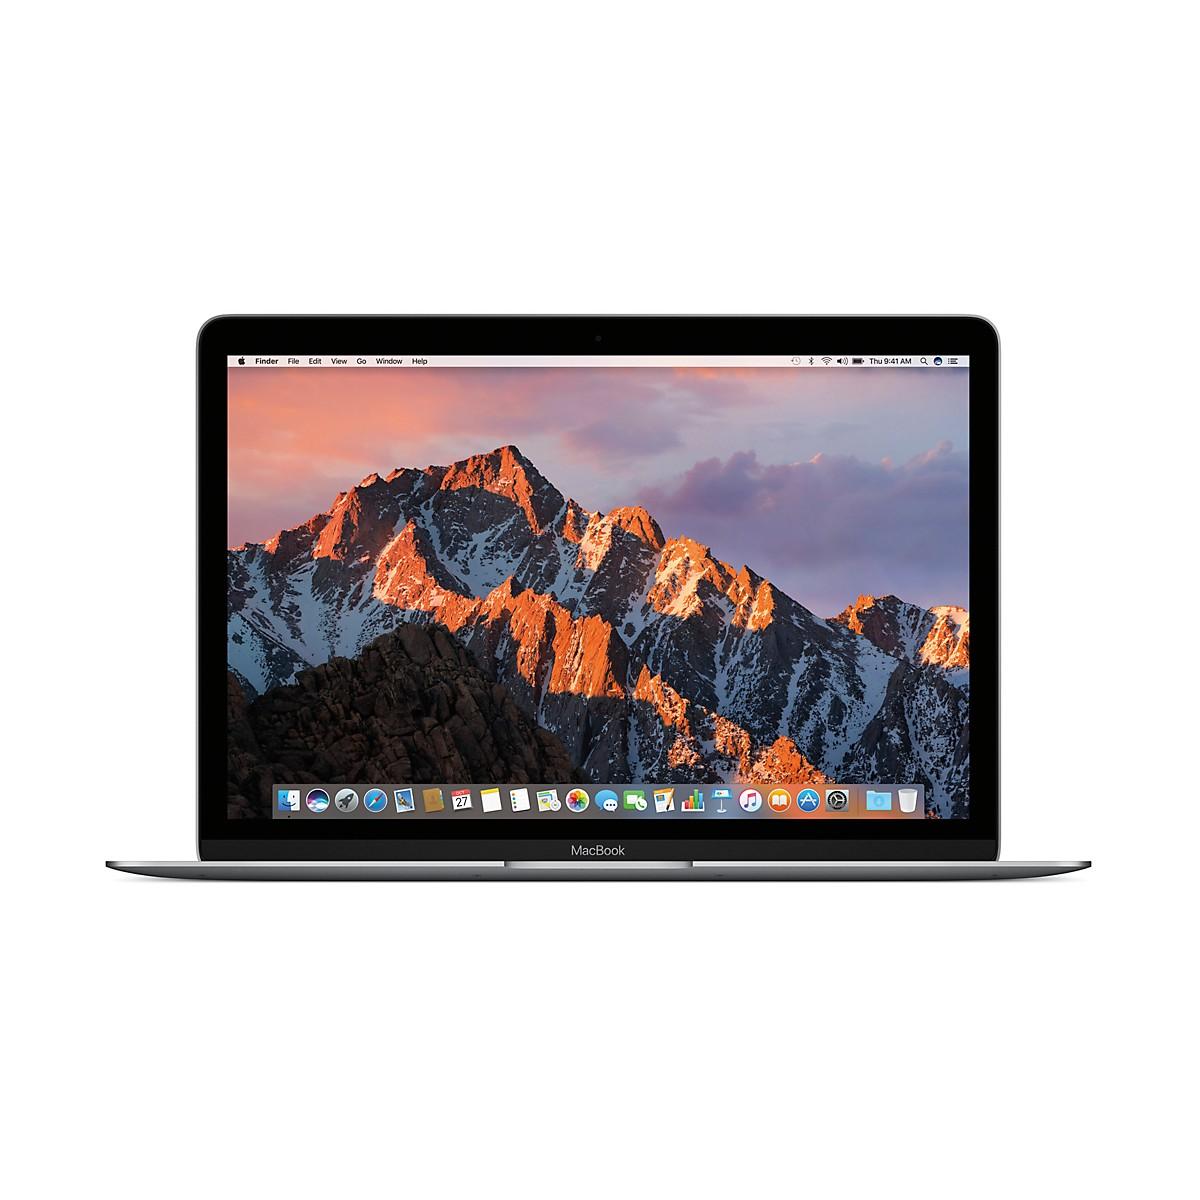 Apple 2017 MacBook 12 in. Core i5 1.3GHz 8GB RAM 512GB SSD Space Gray (MNYG2LL/A)